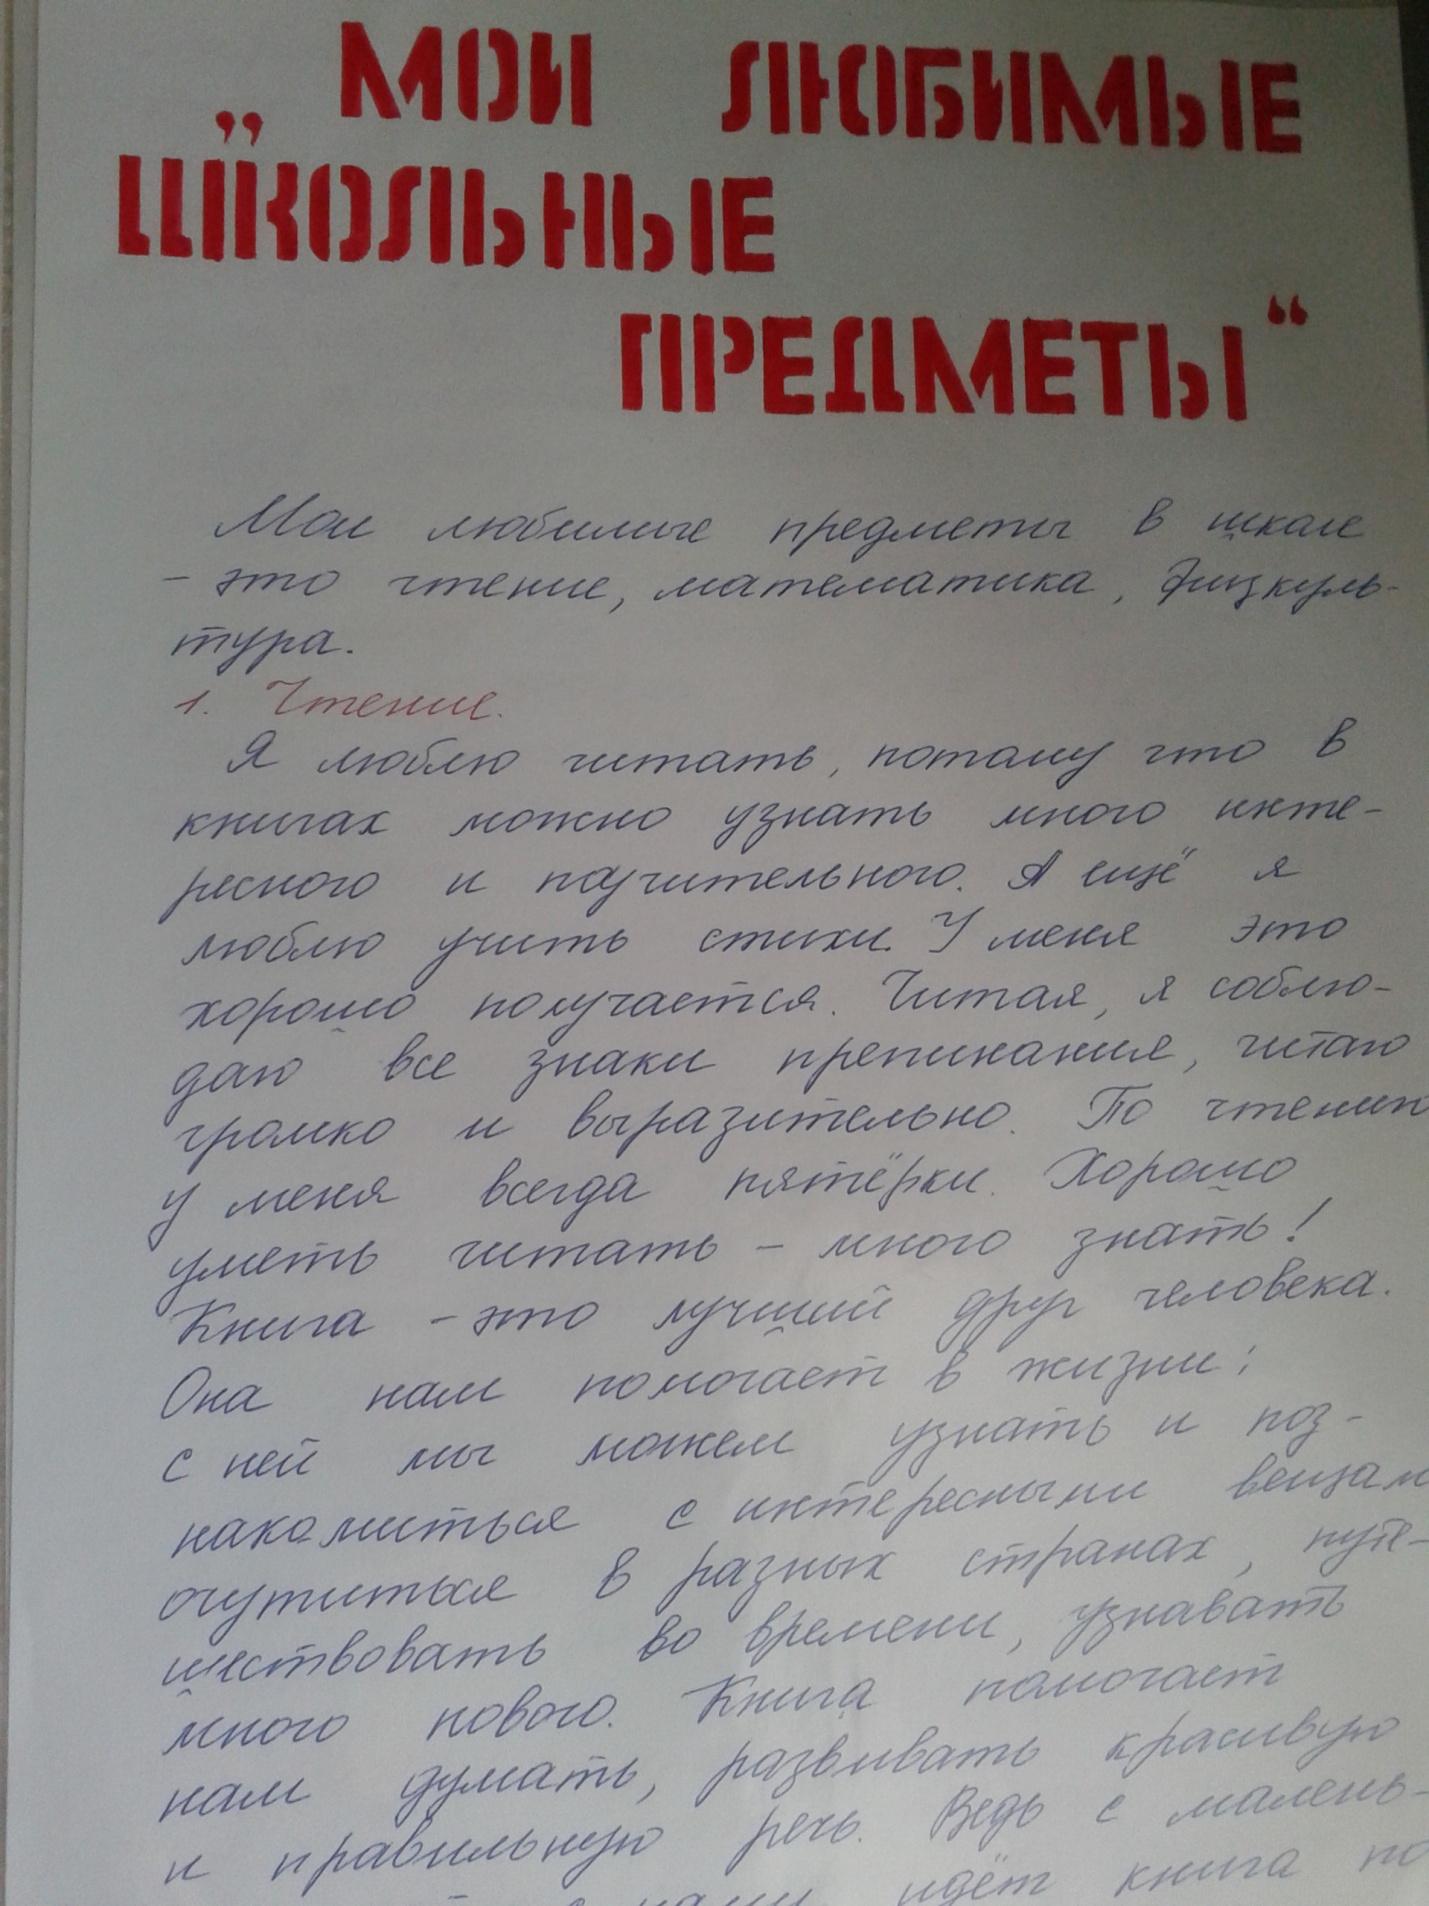 C:\Users\Vladimir\Pictures\2016-01-21 долматов портфолио\долматов портфолио 033.jpg